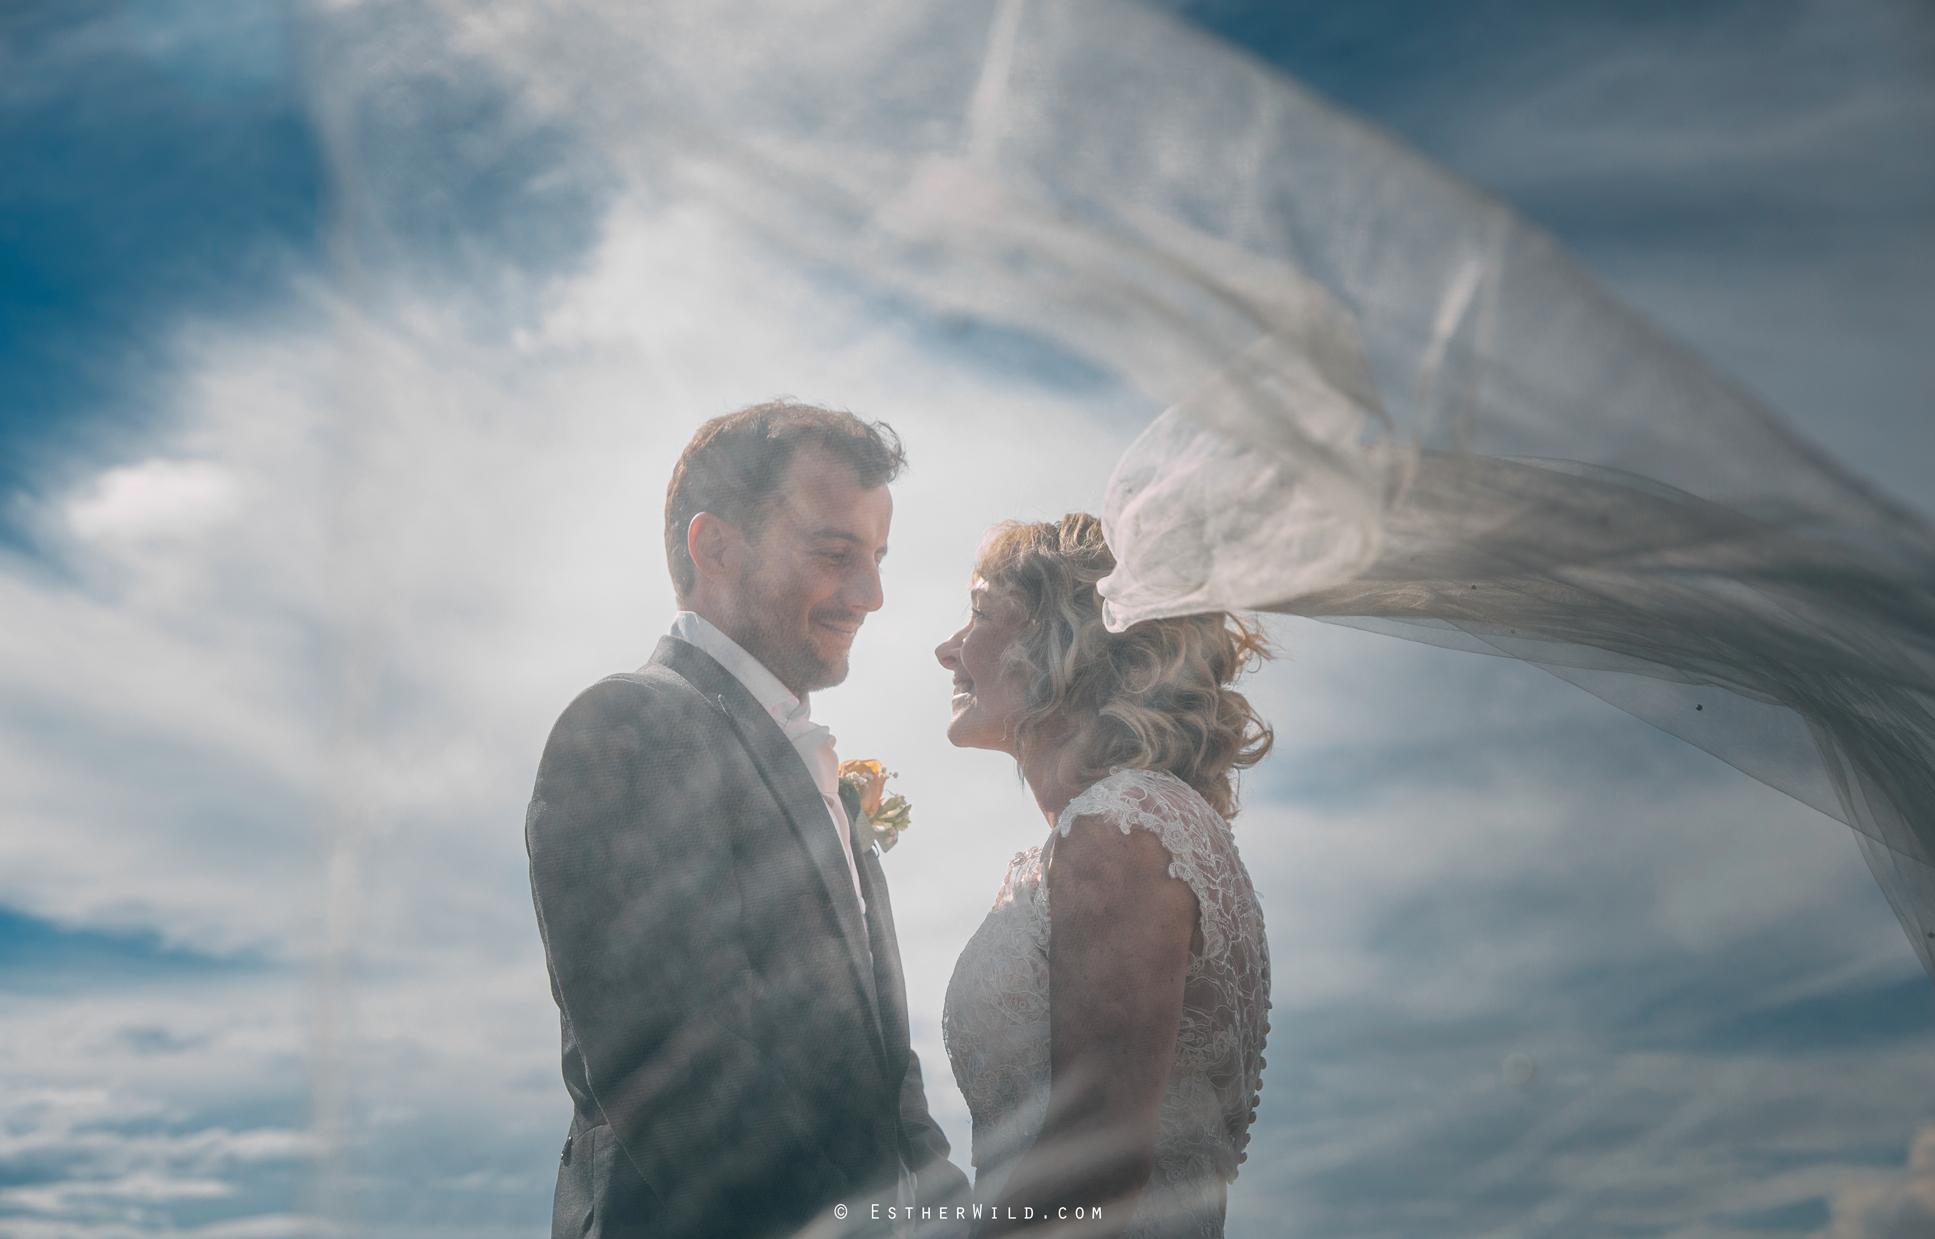 0817_Rathskellar_Kings_Lynn_East_Lexham_Church_Wedding_Photographer_Esther_Wild_IMG_1583-1.jpg